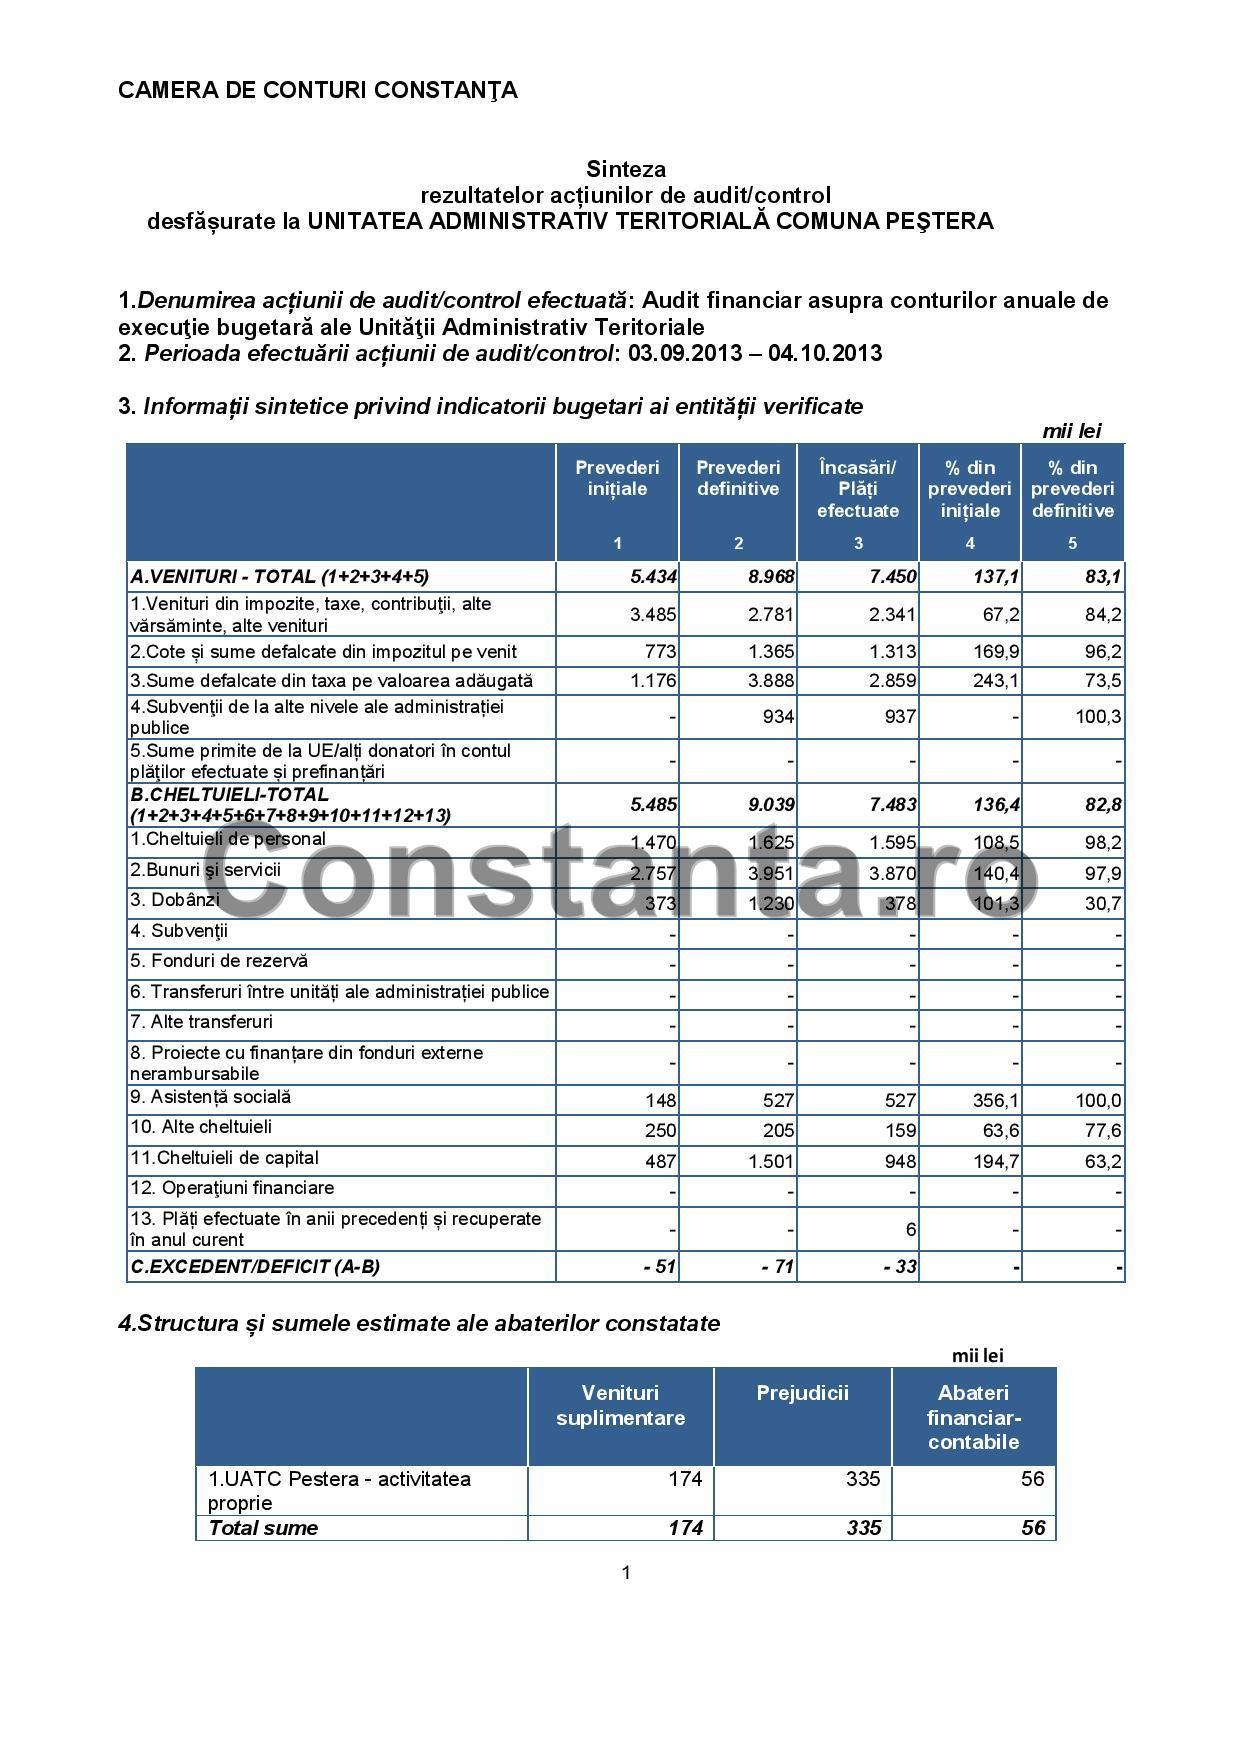 UATC-Pestera-page-001